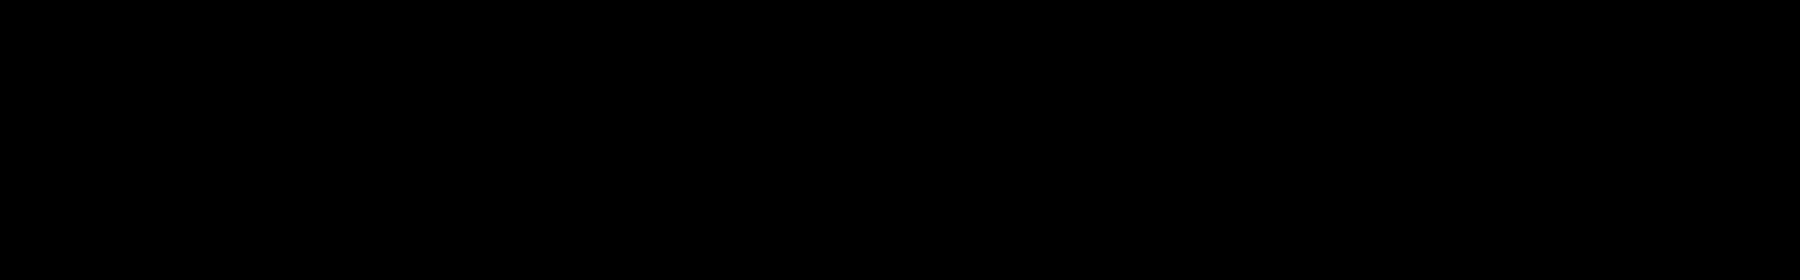 Shakyton audio waveform